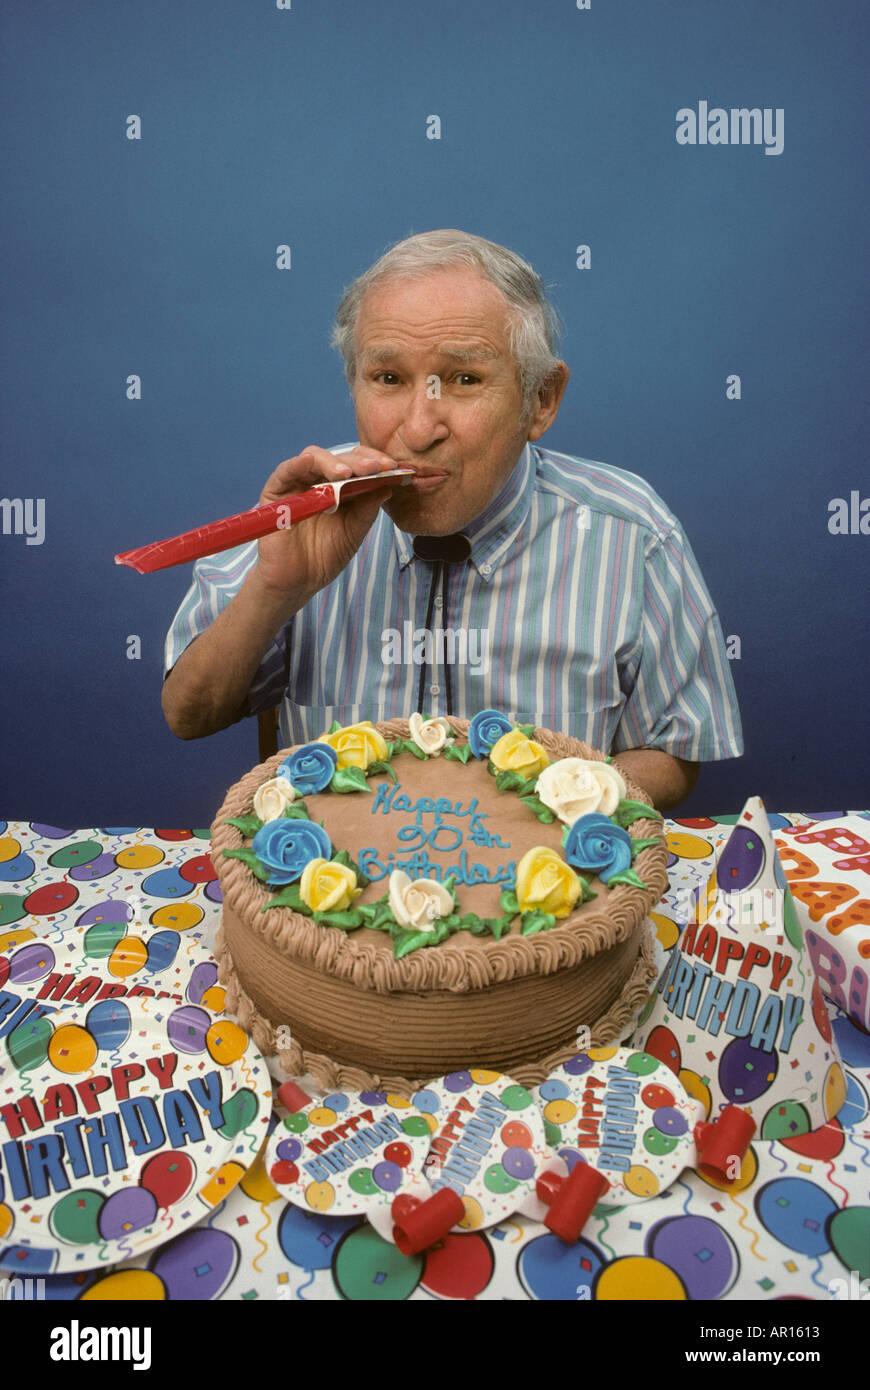 Birthday Cake 90 Year Old Stock Photos Birthday Cake 90 Year Old